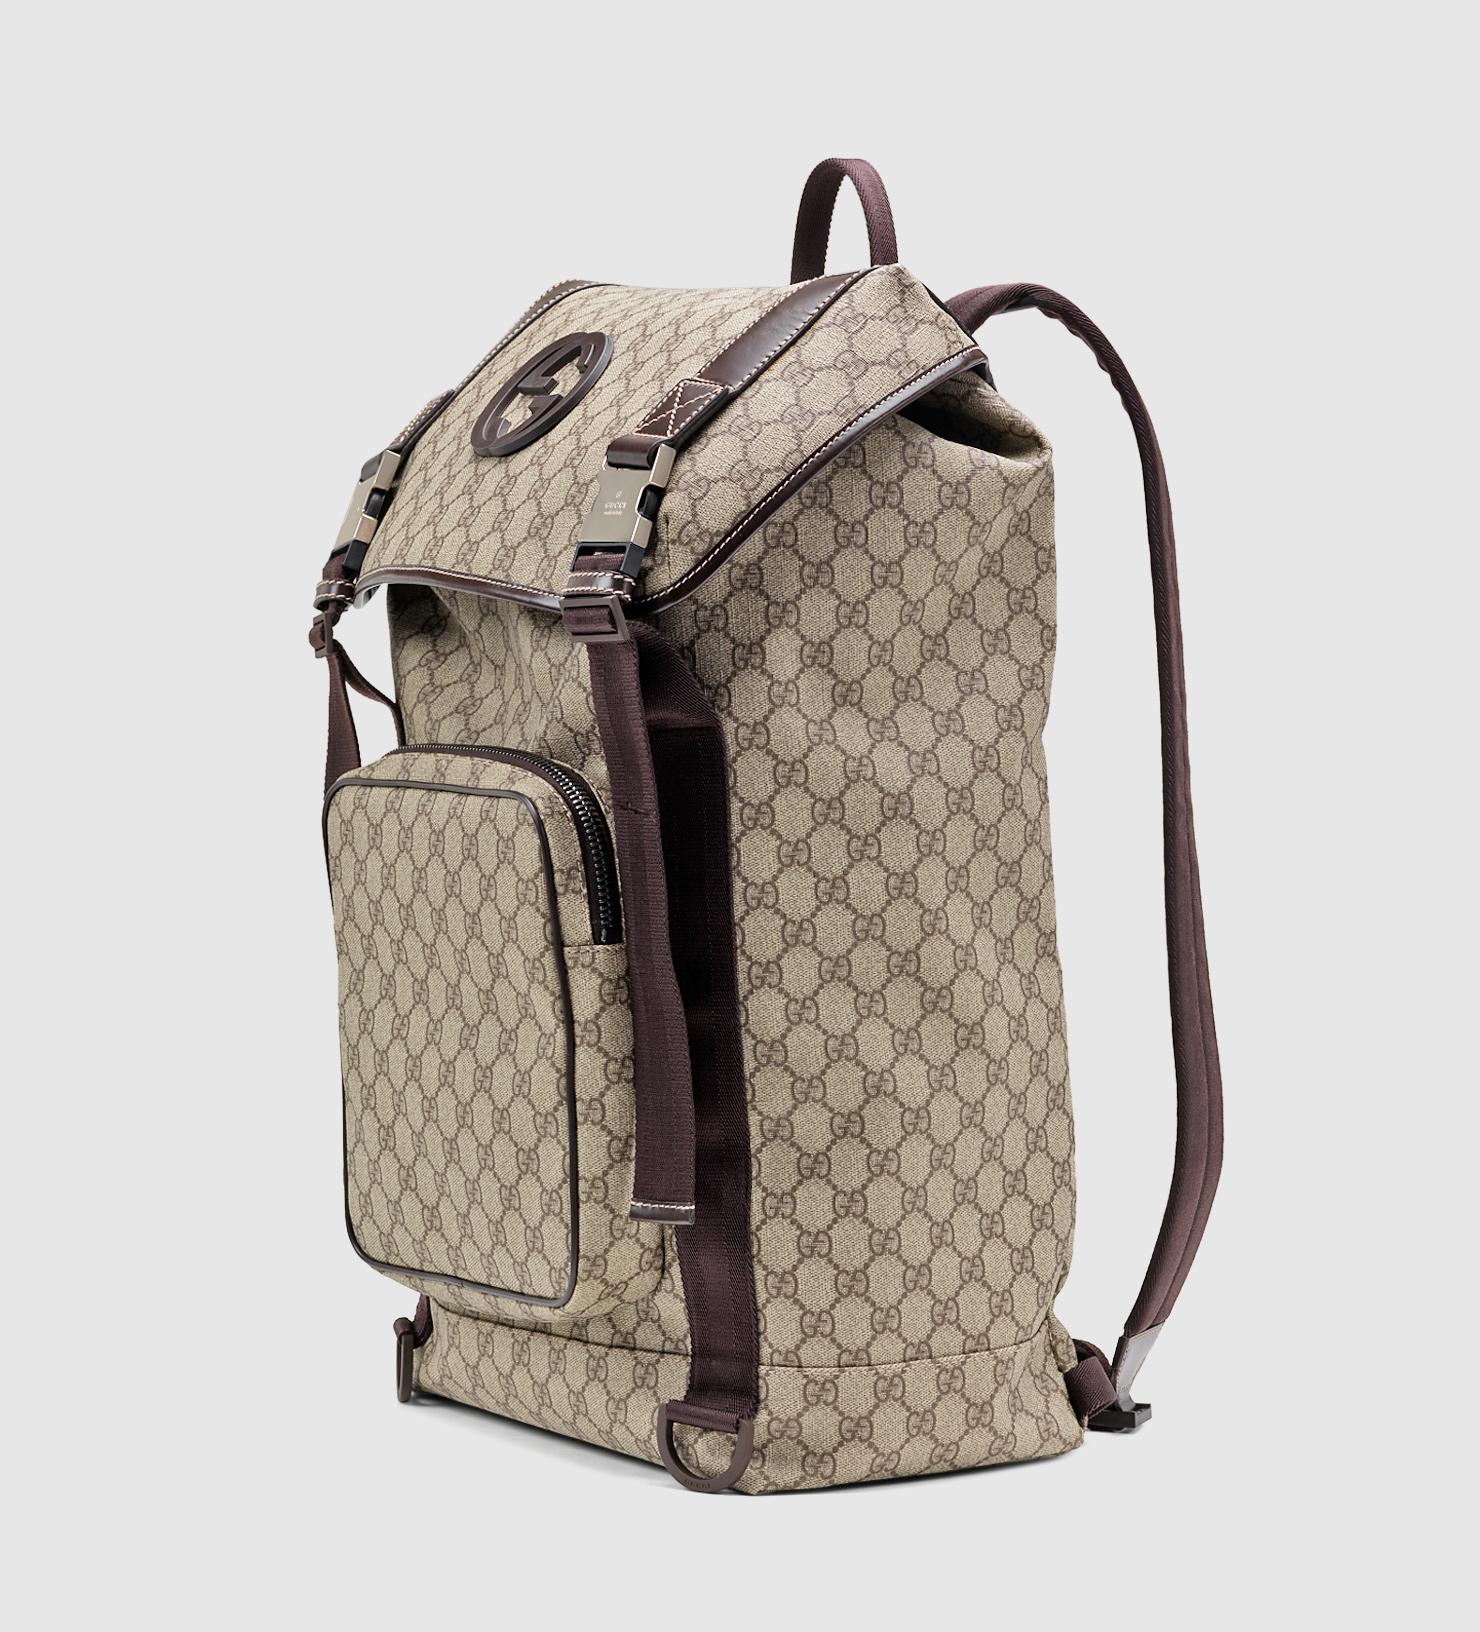 Gucci Gg Supreme Canvas Interlocking G Backpack In Natural For Men